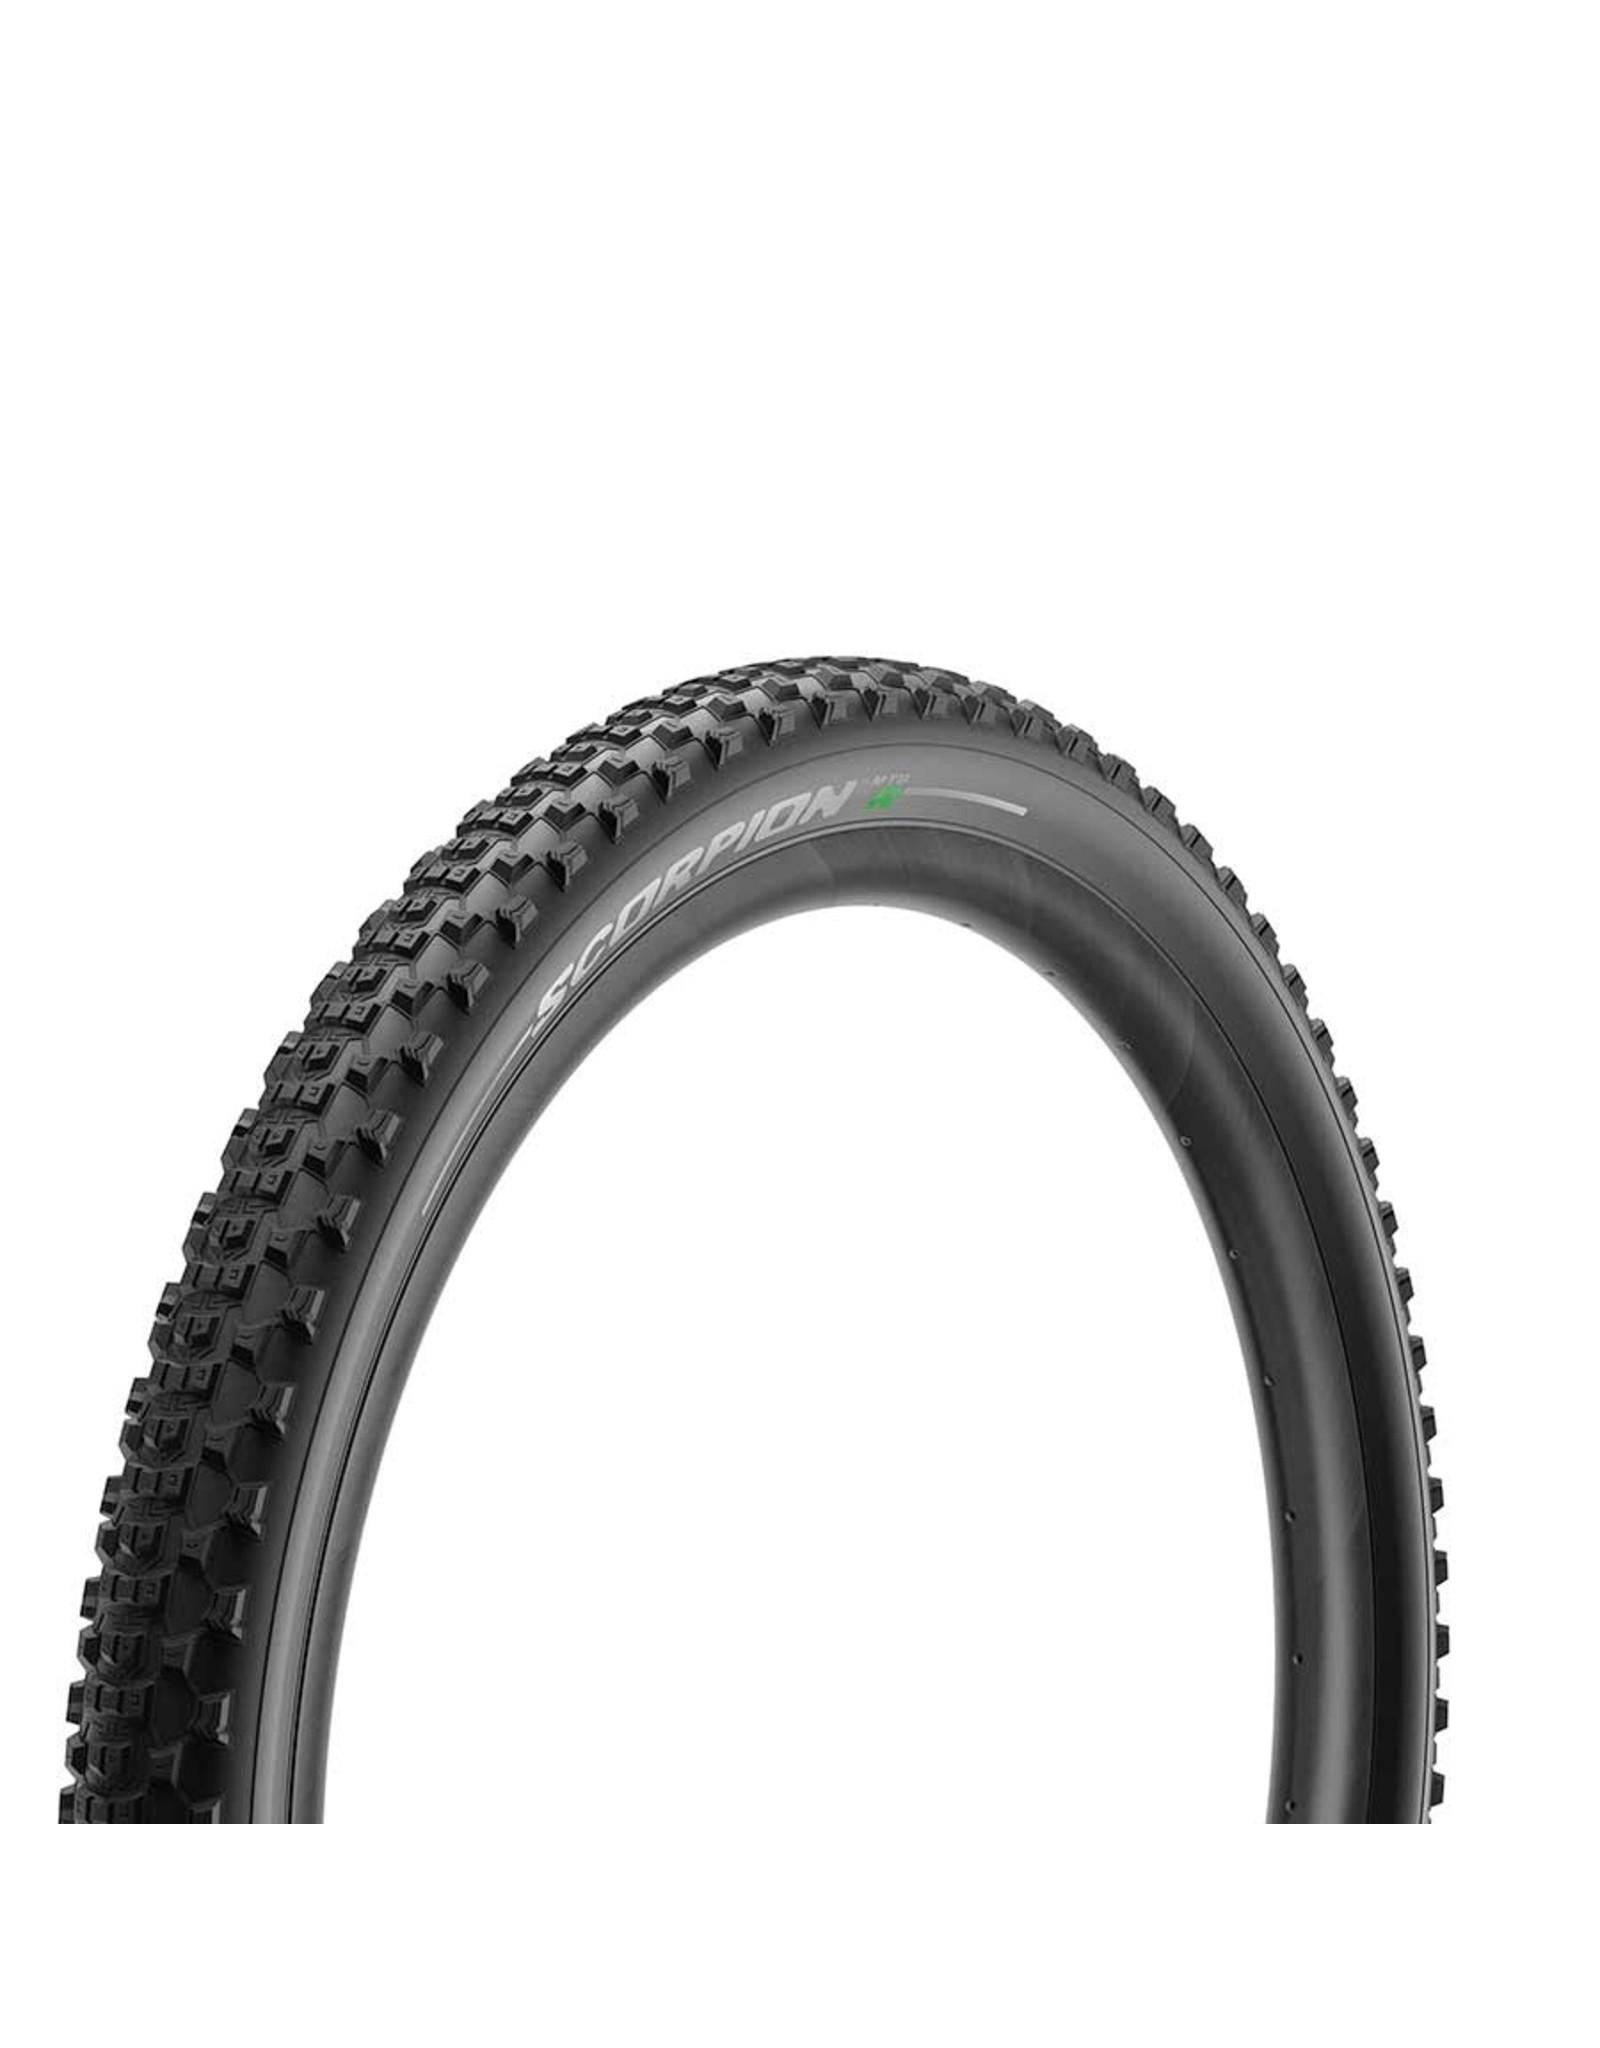 Pirelli, Scorpion MTB R, Tire, 29''x2.40, Folding, Tubeless Ready, Smartgrip, 60TPI, Black